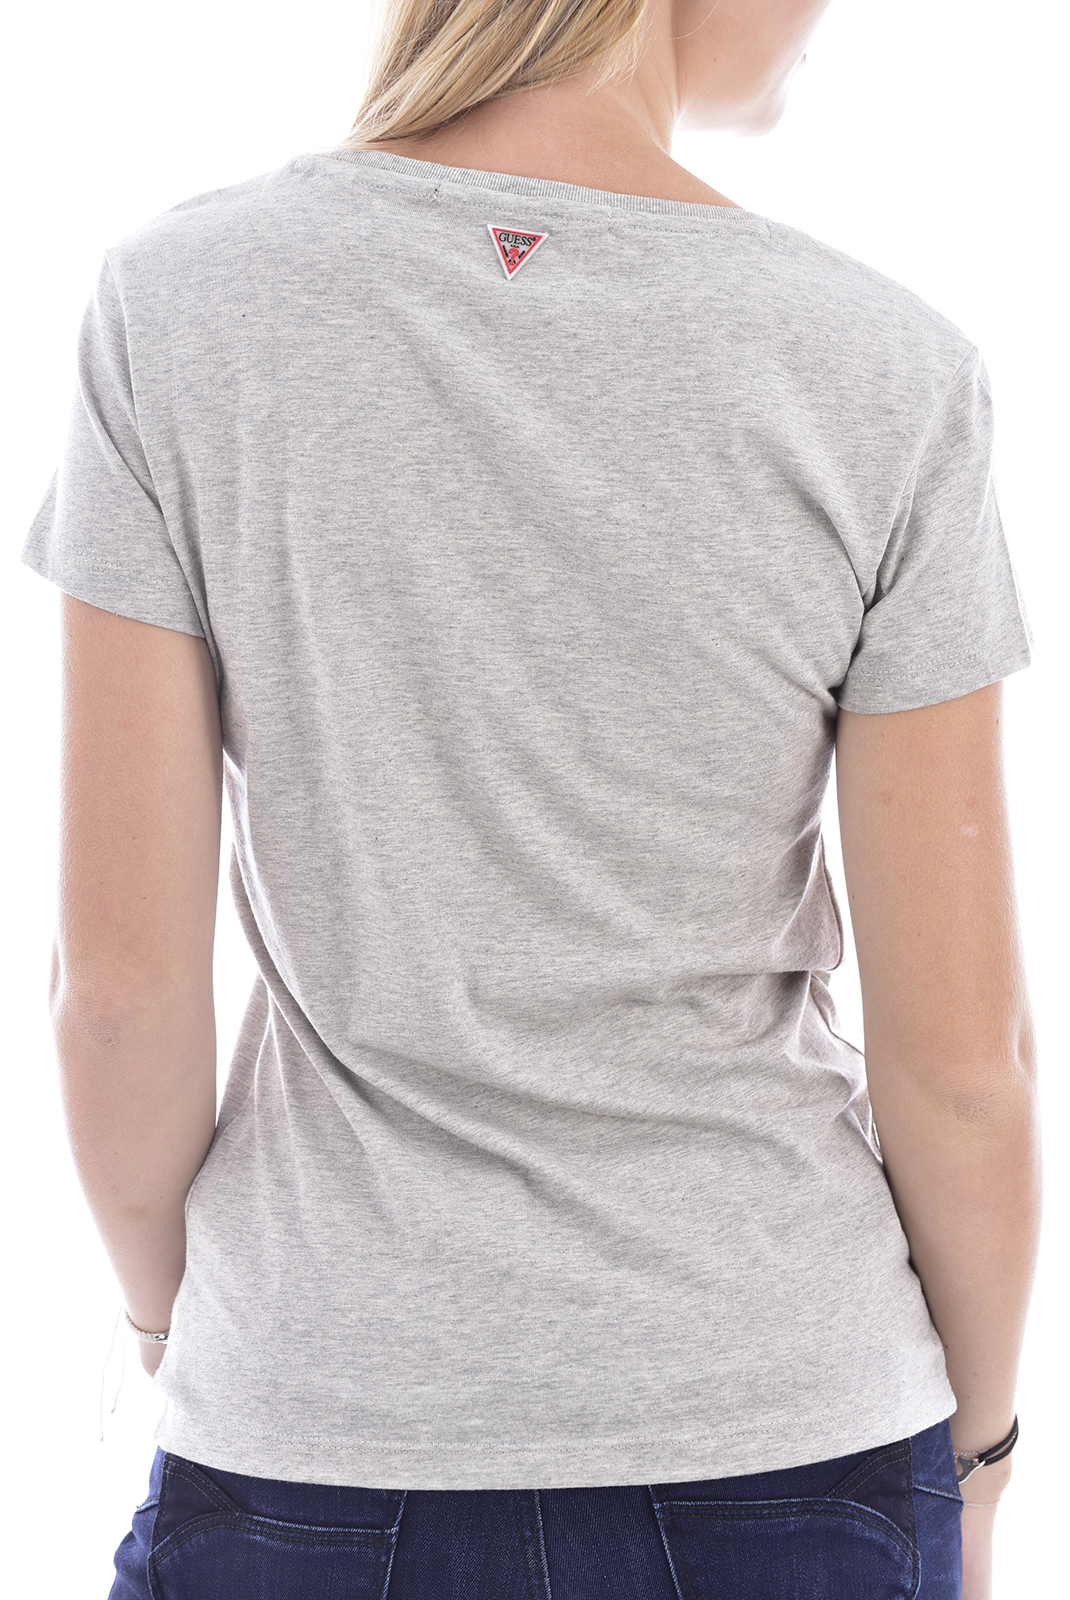 Tee shirt  Guess jeans O0BA71 K8HM0 M90